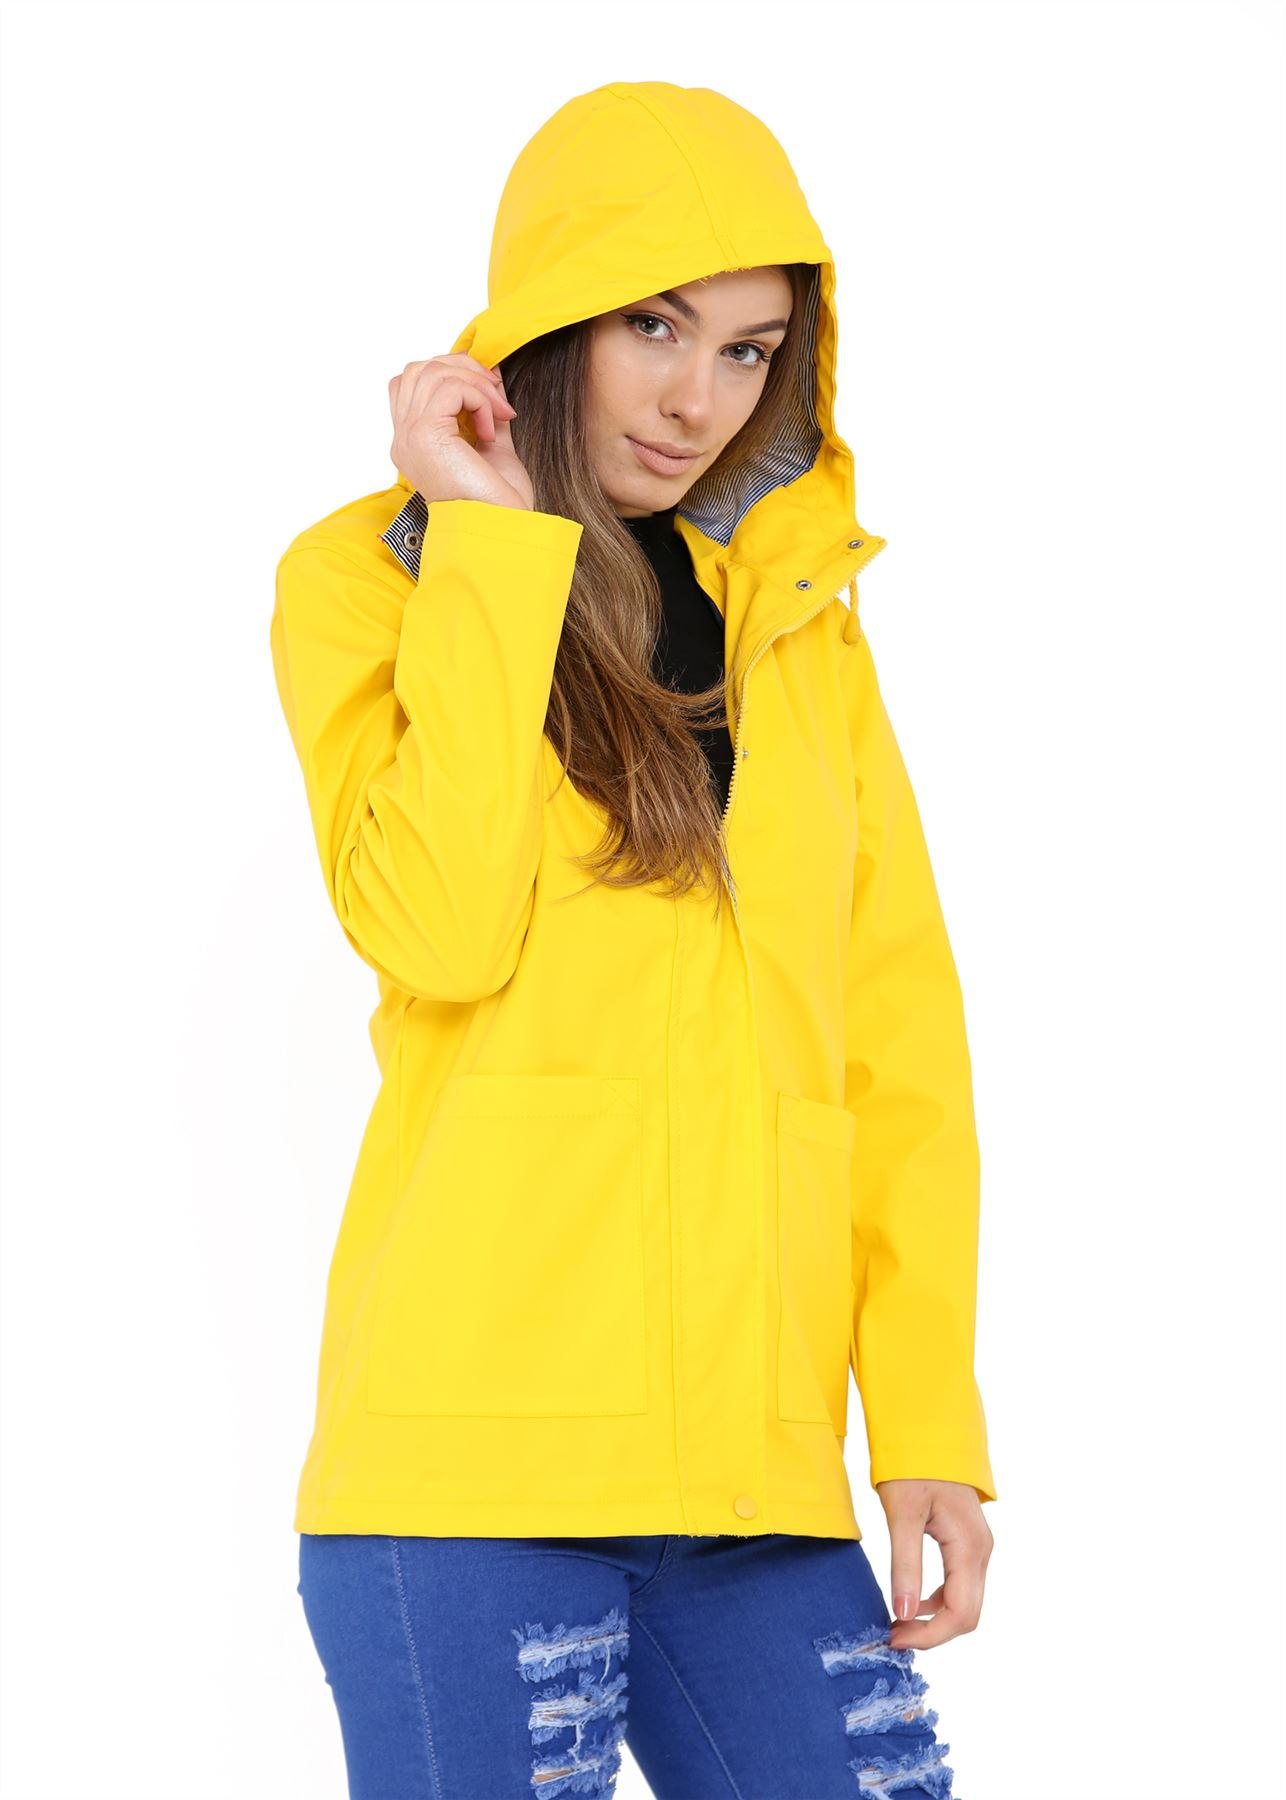 New-Womens-Lightweight-Rain-Trench-Coat-Jacket-Parka-Daily-Rain-Mac thumbnail 6